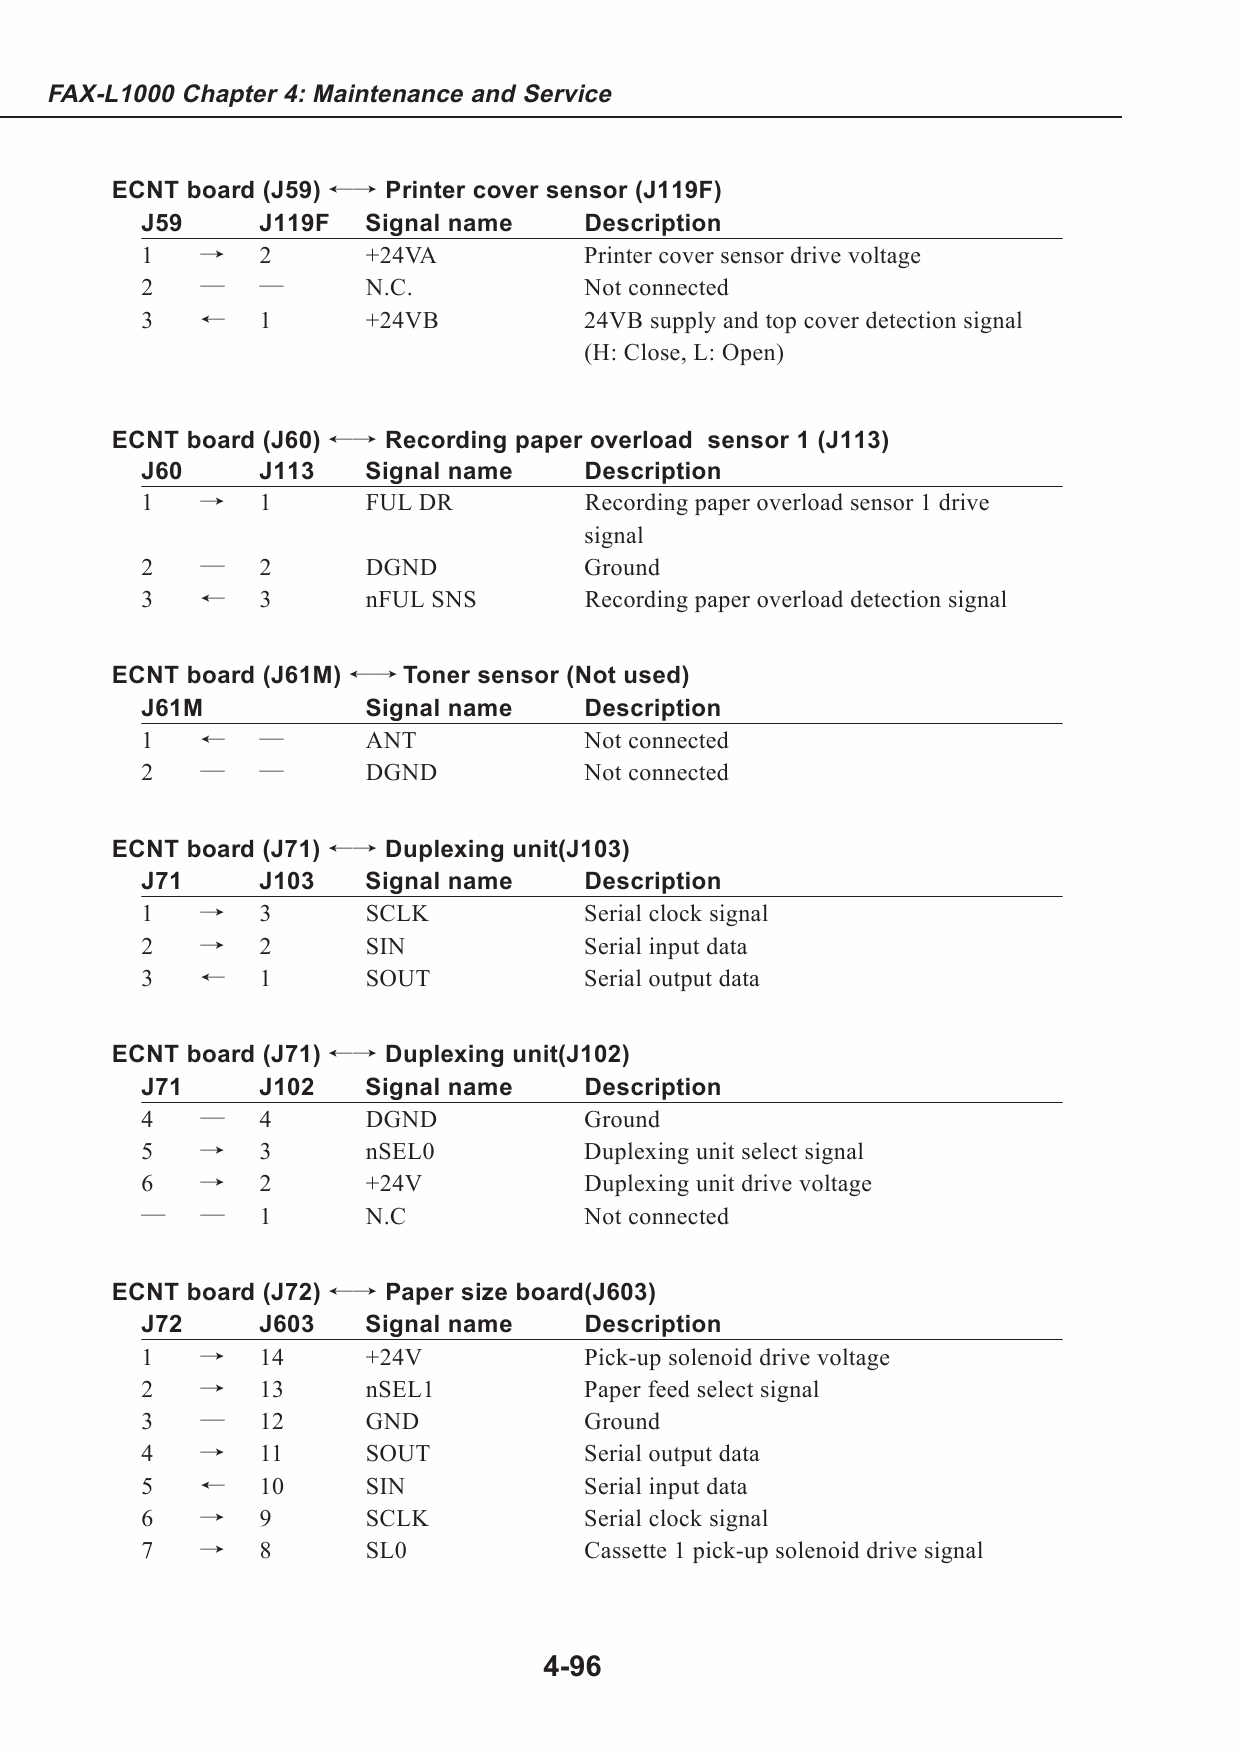 canon fax l1000 parts and service manual